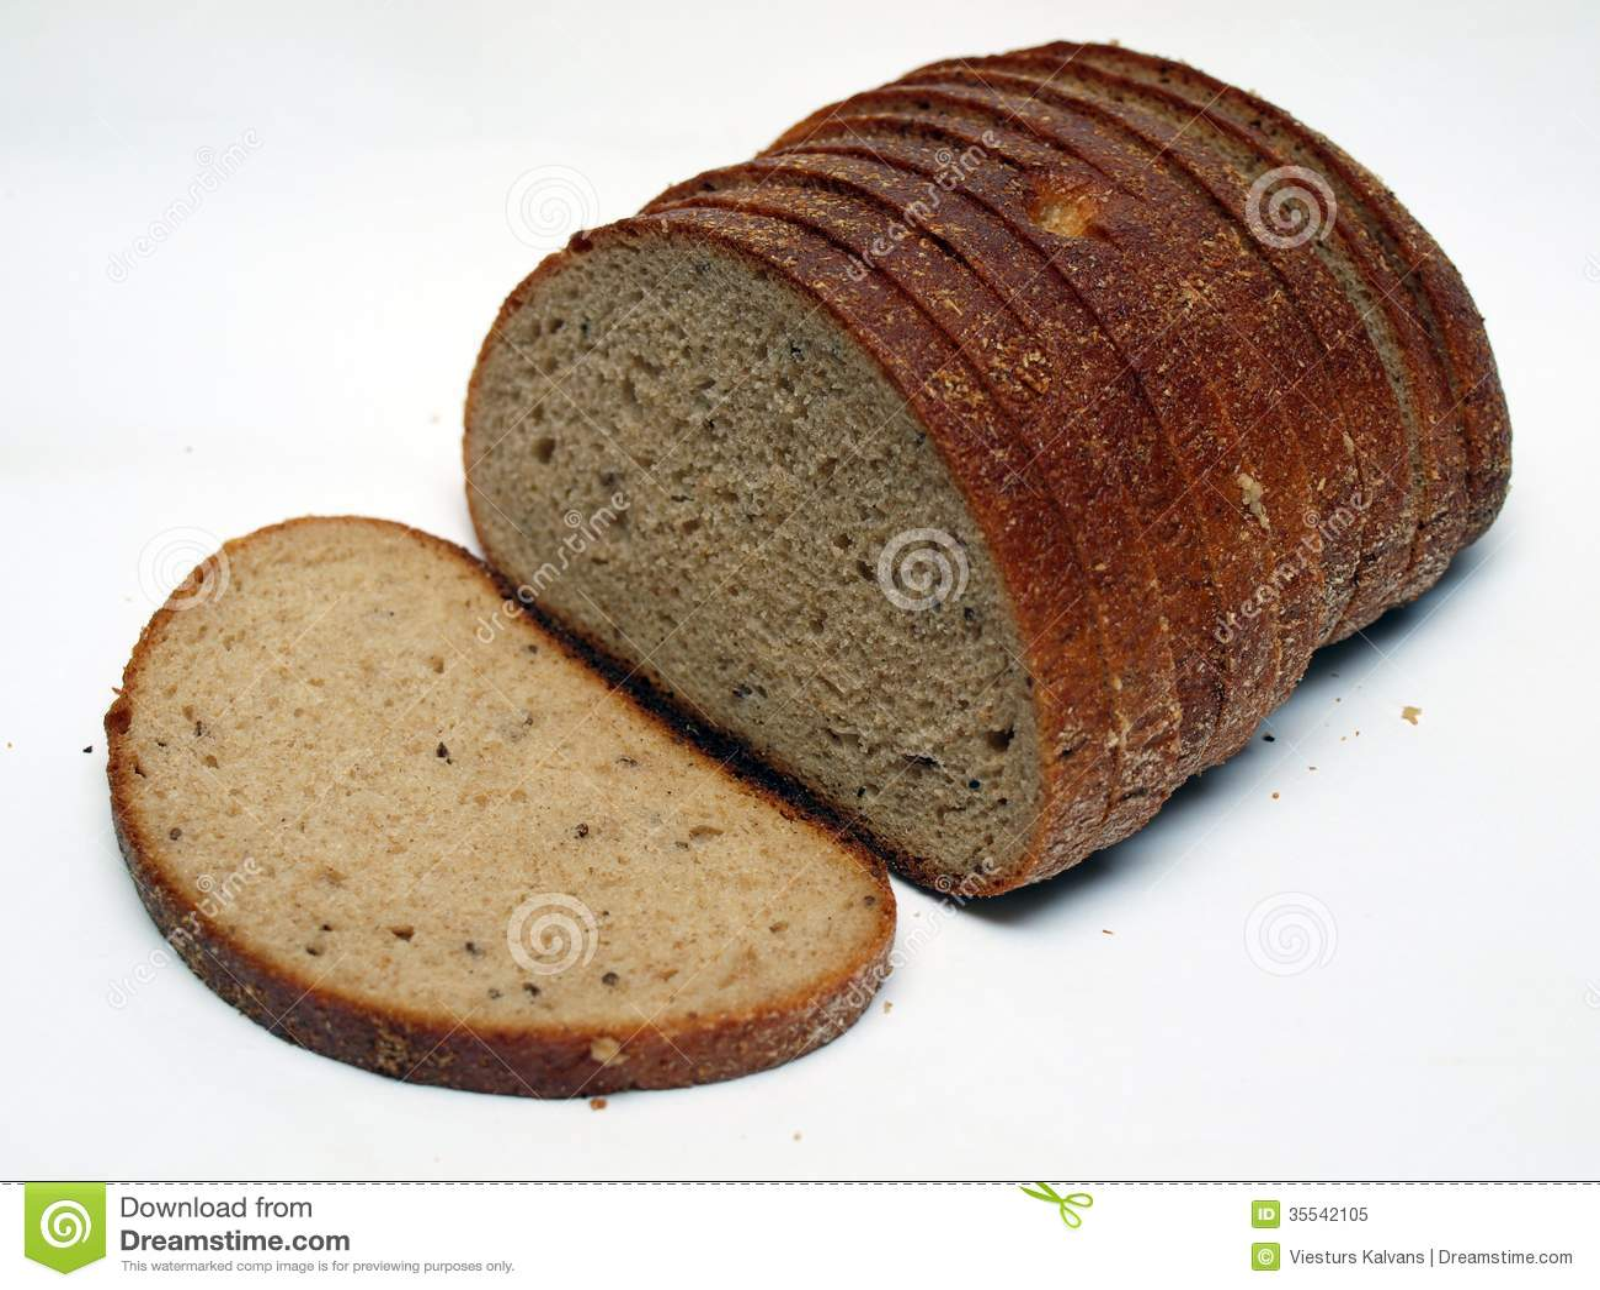 rye bread rye breads crumb shot the very best rye bread dark rye bread ...